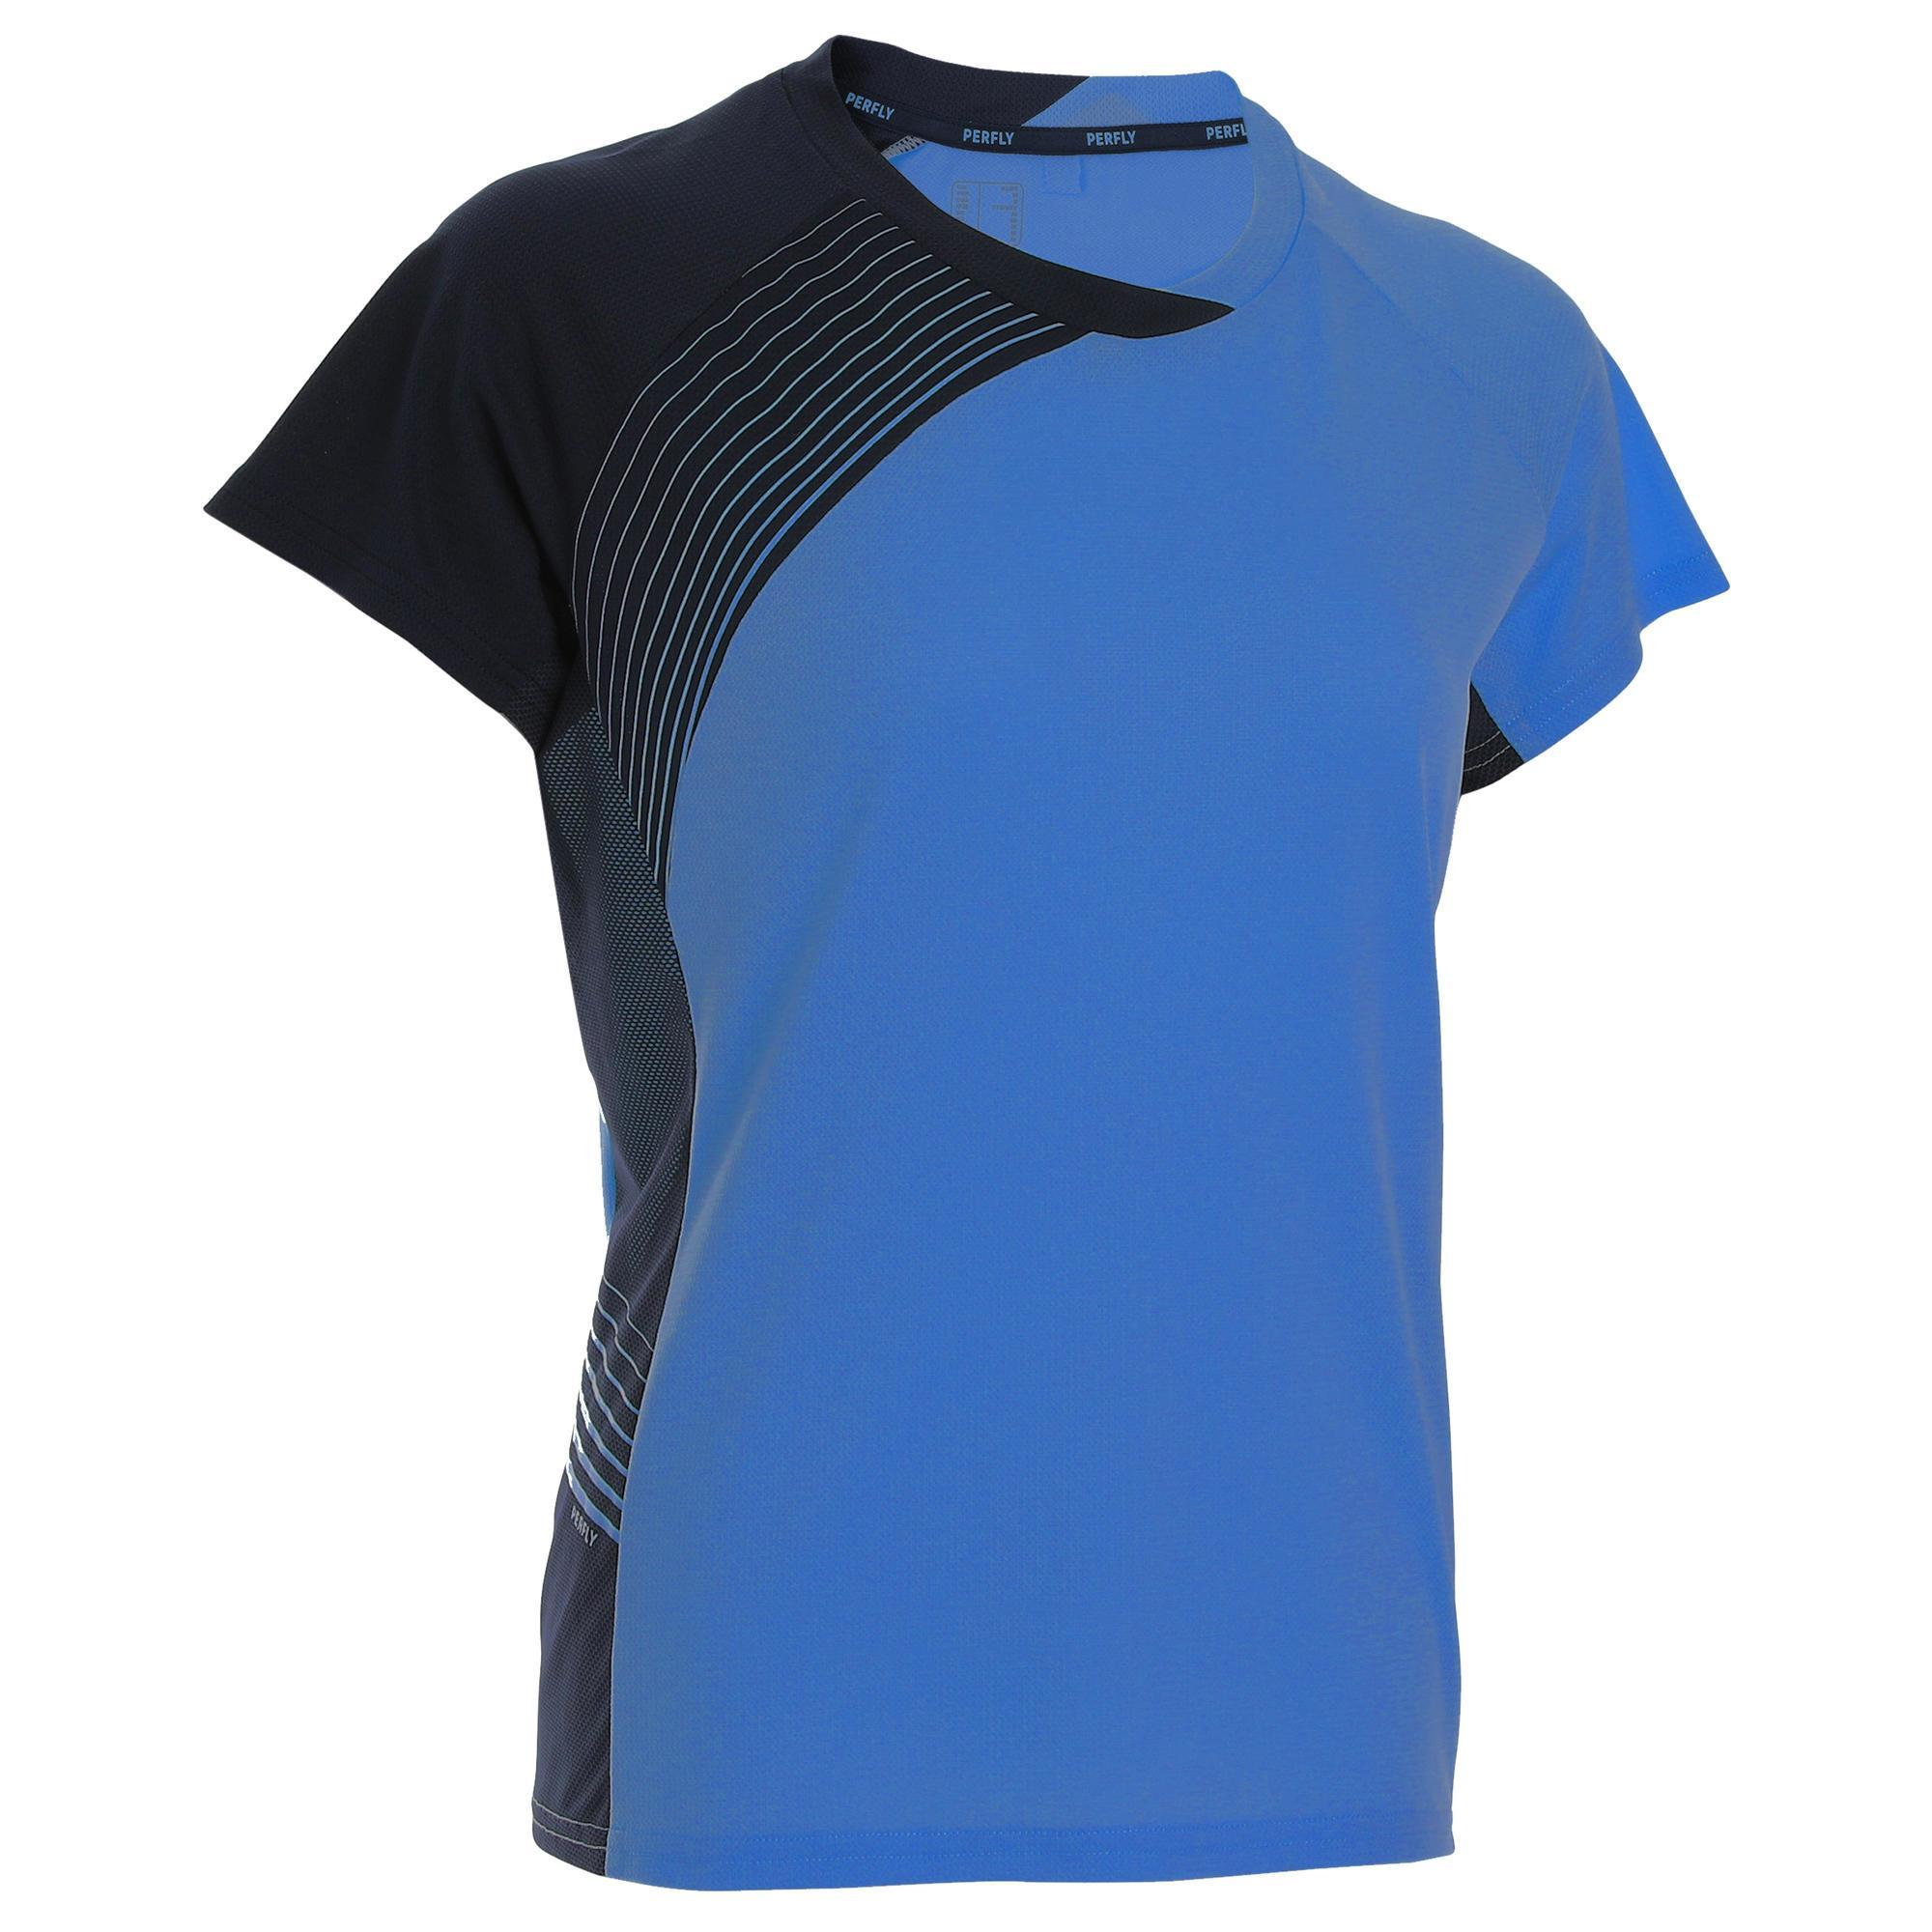 Perfly T-shirt 530 D marine blauw